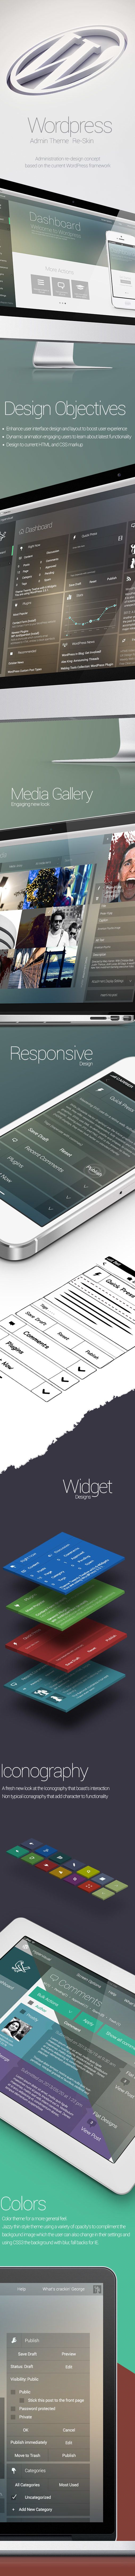 WordPress Admin Theme Redesign by George Kordas, via Behance